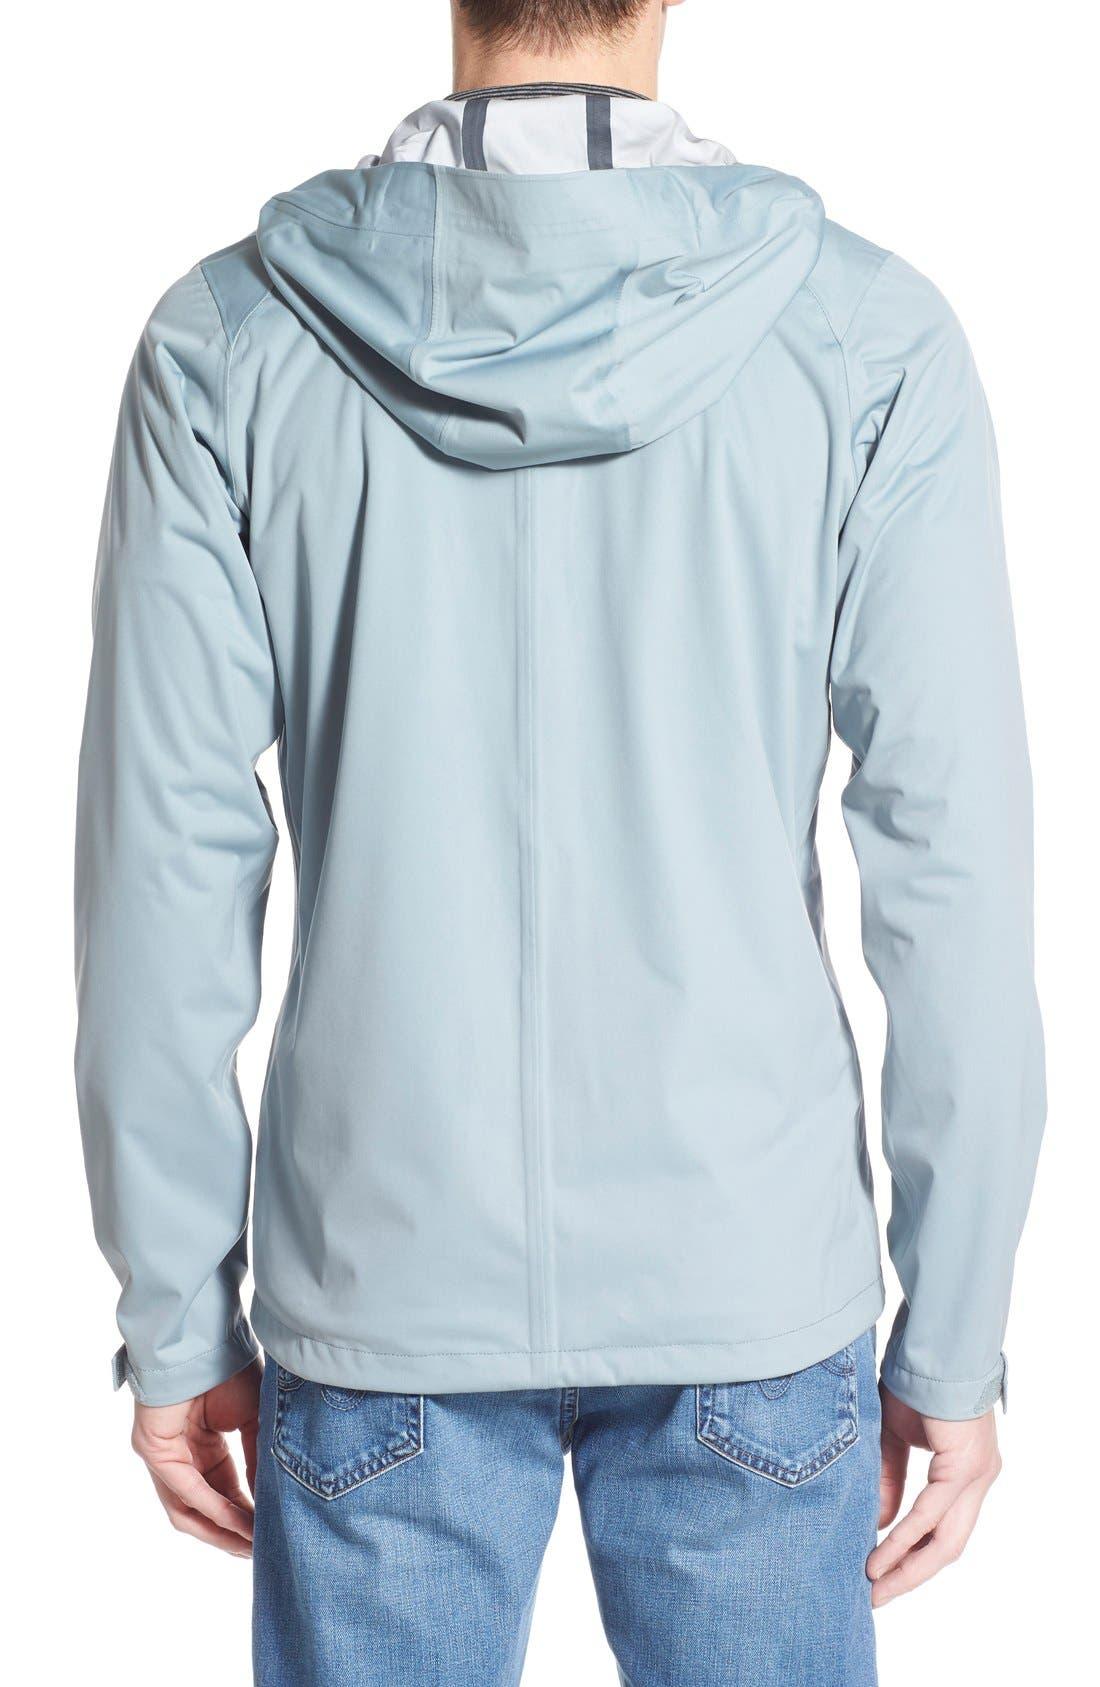 'Rebound' Regular Fit Zip Hooded Jacket,                             Alternate thumbnail 2, color,                             073